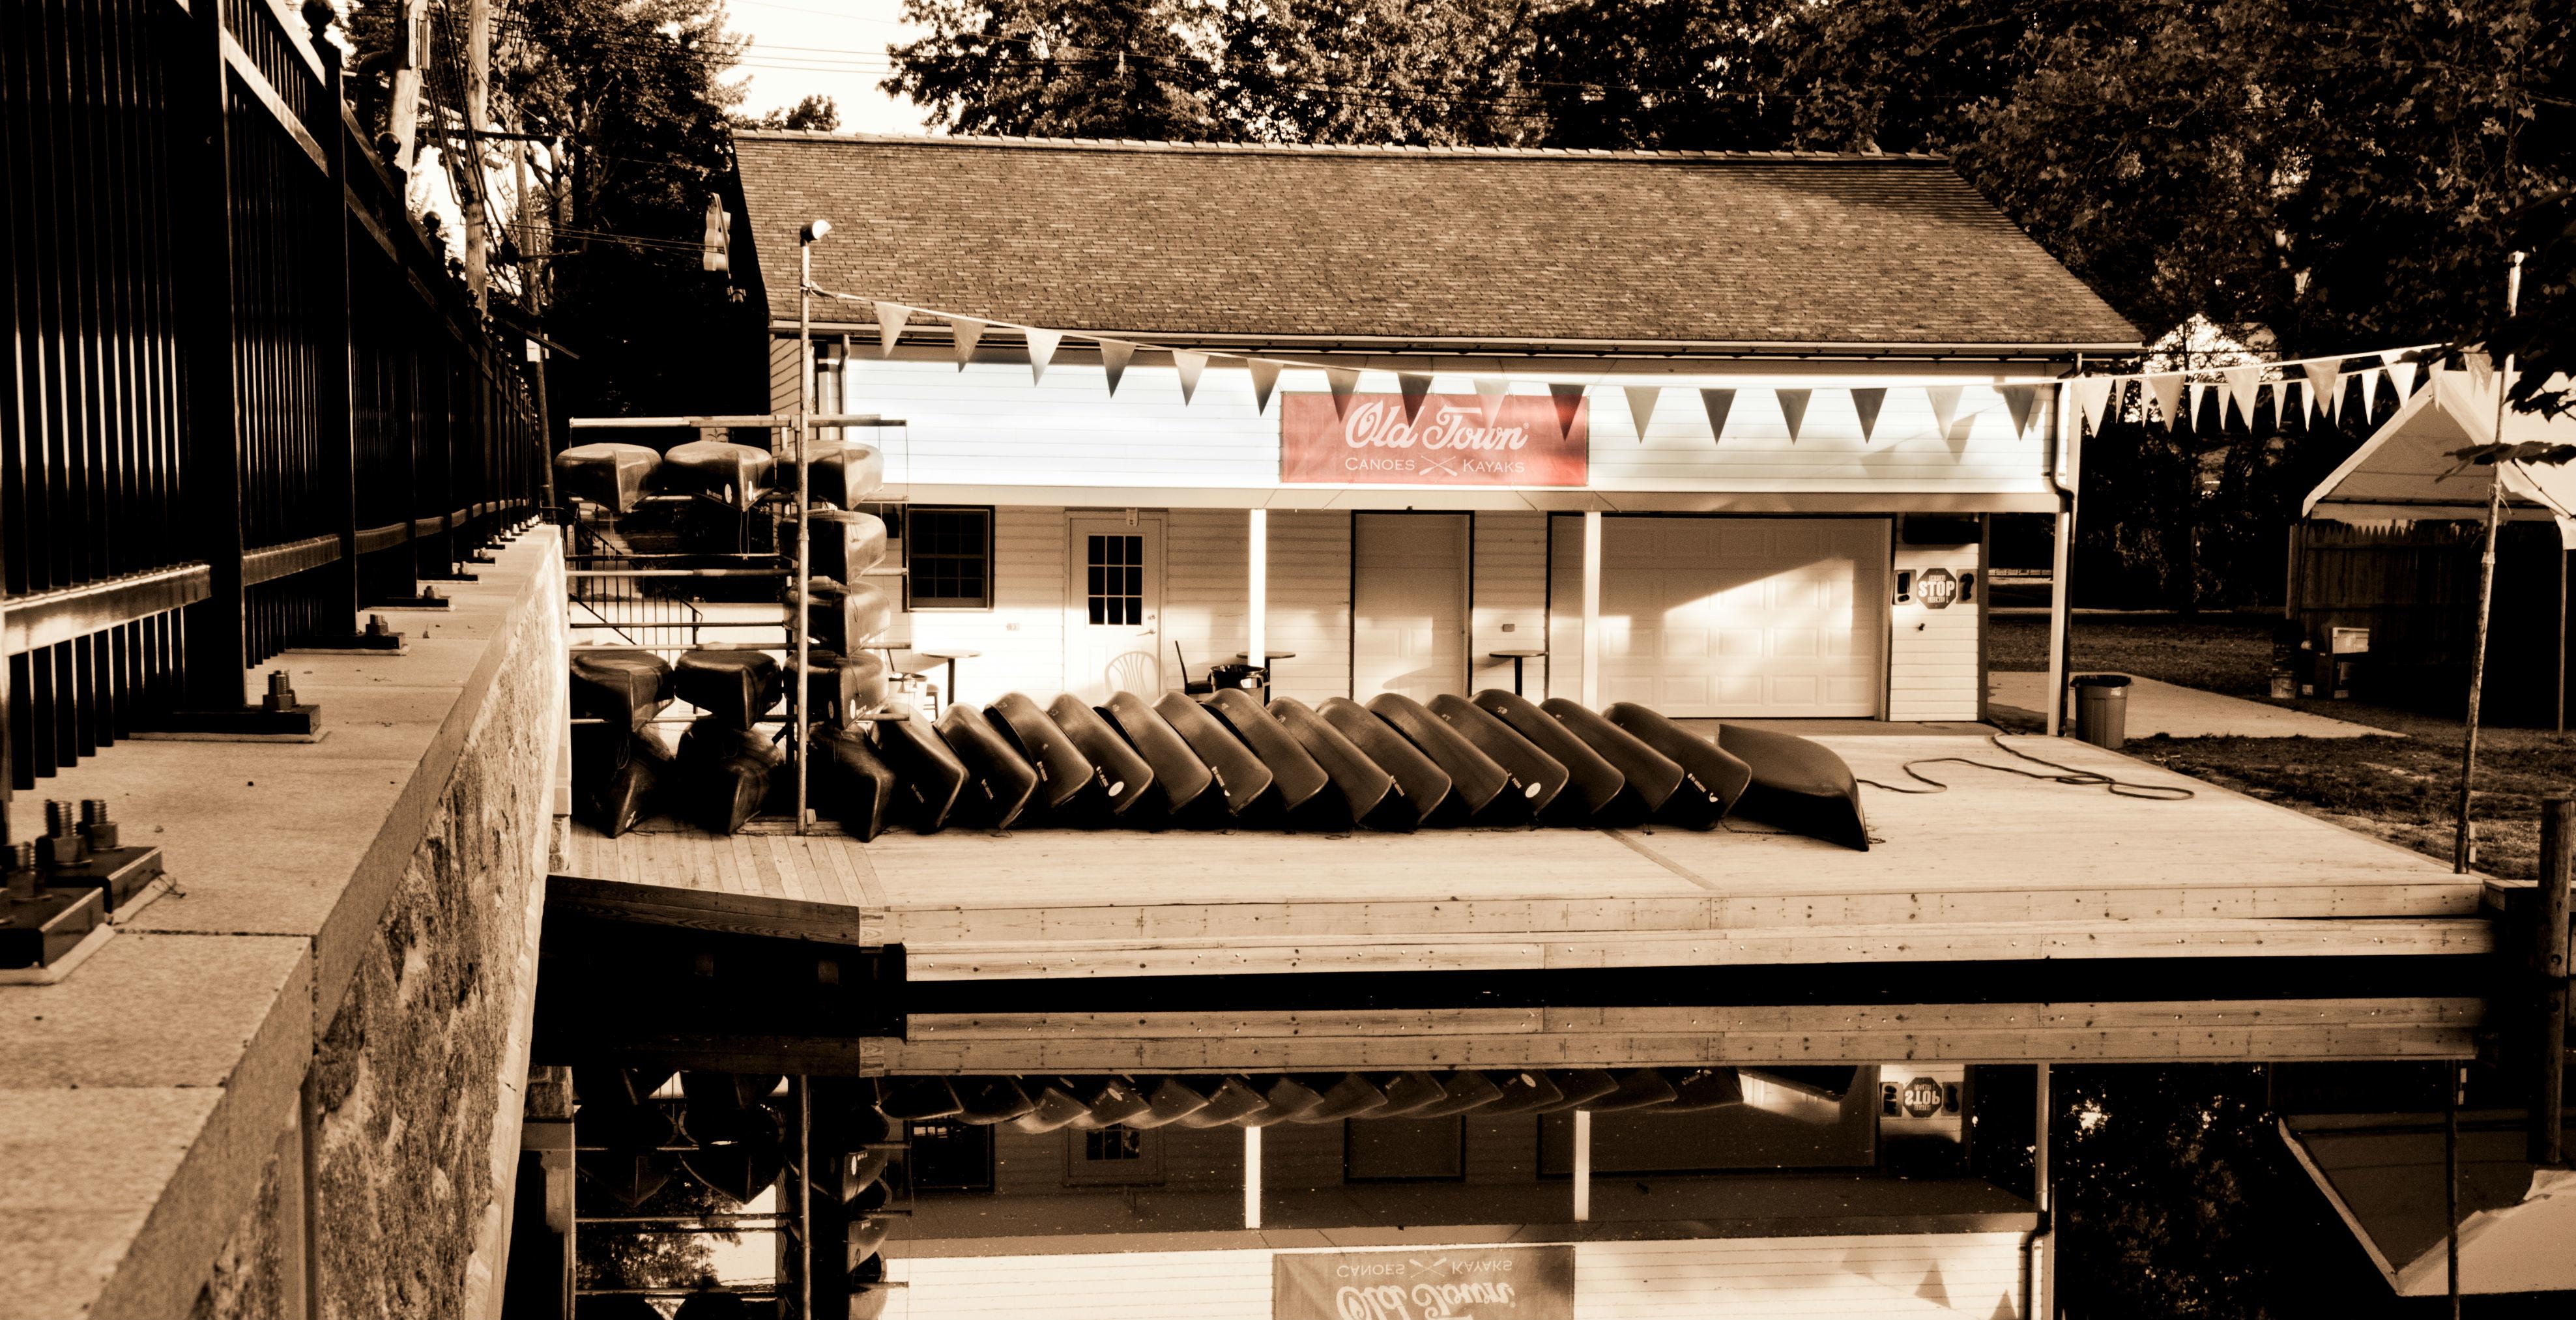 b36a446533b856234d3f_canoe_club.jpg